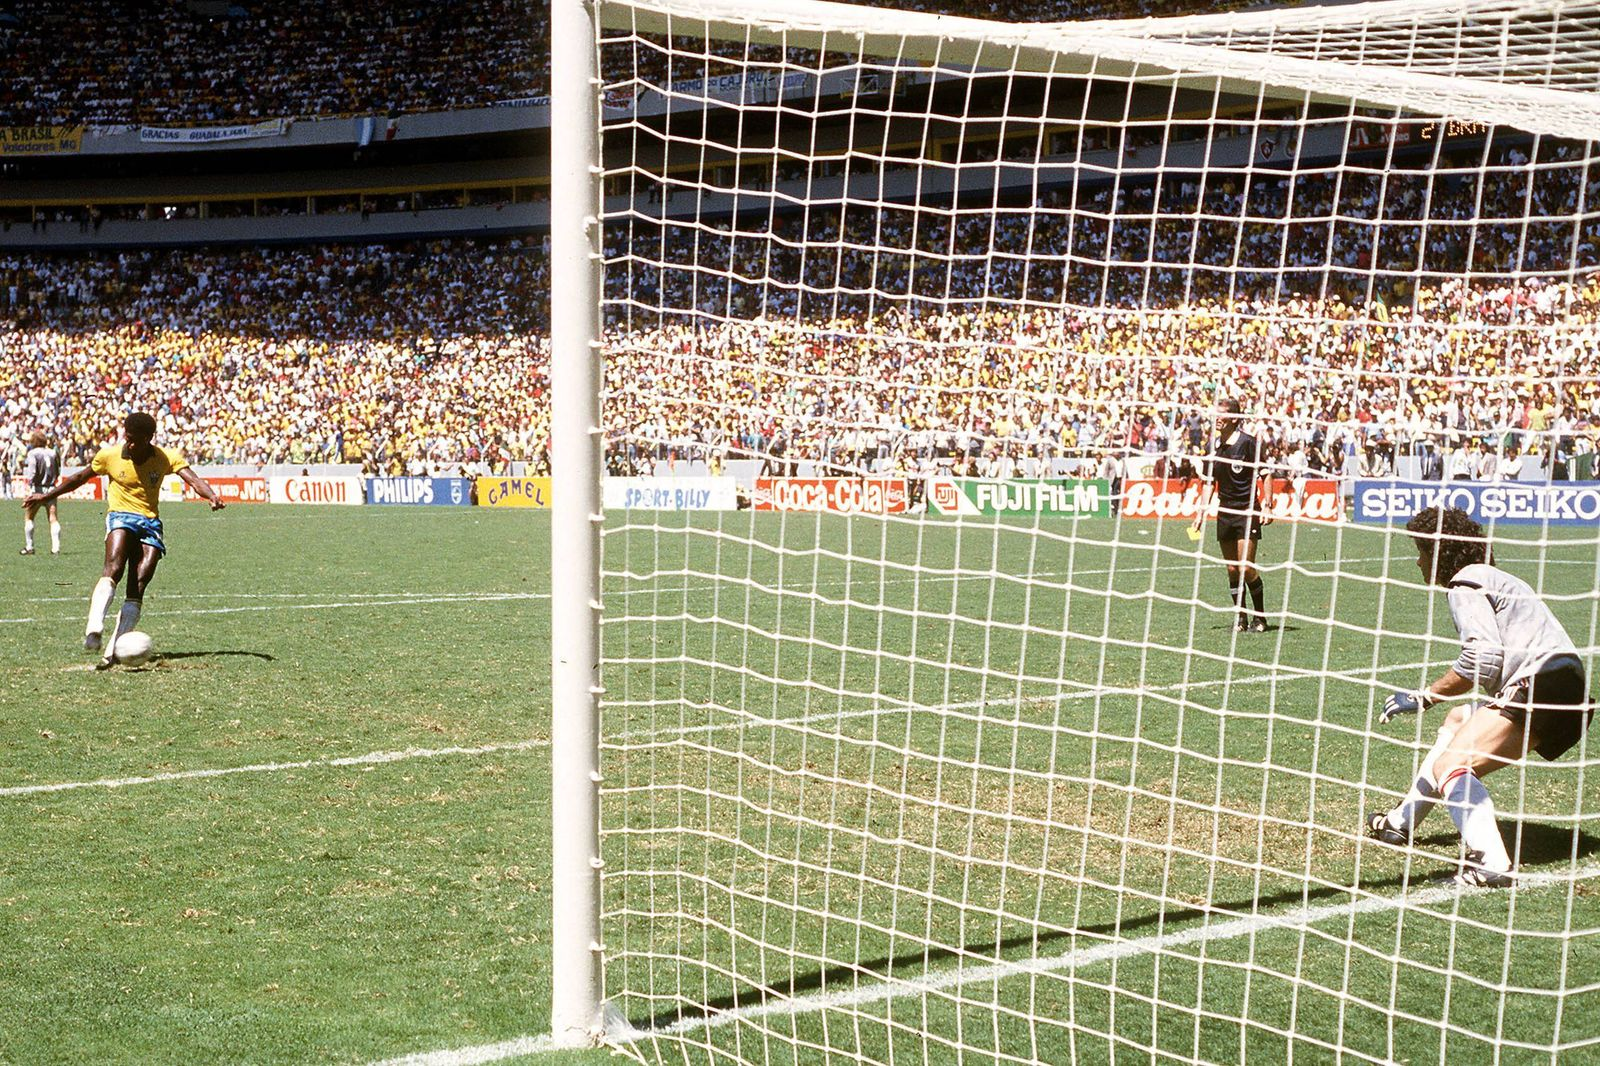 Julio Cesar li Brasilien gegen Torwart Joel Bats Frankreich Duell vom Elfmeterpunkt